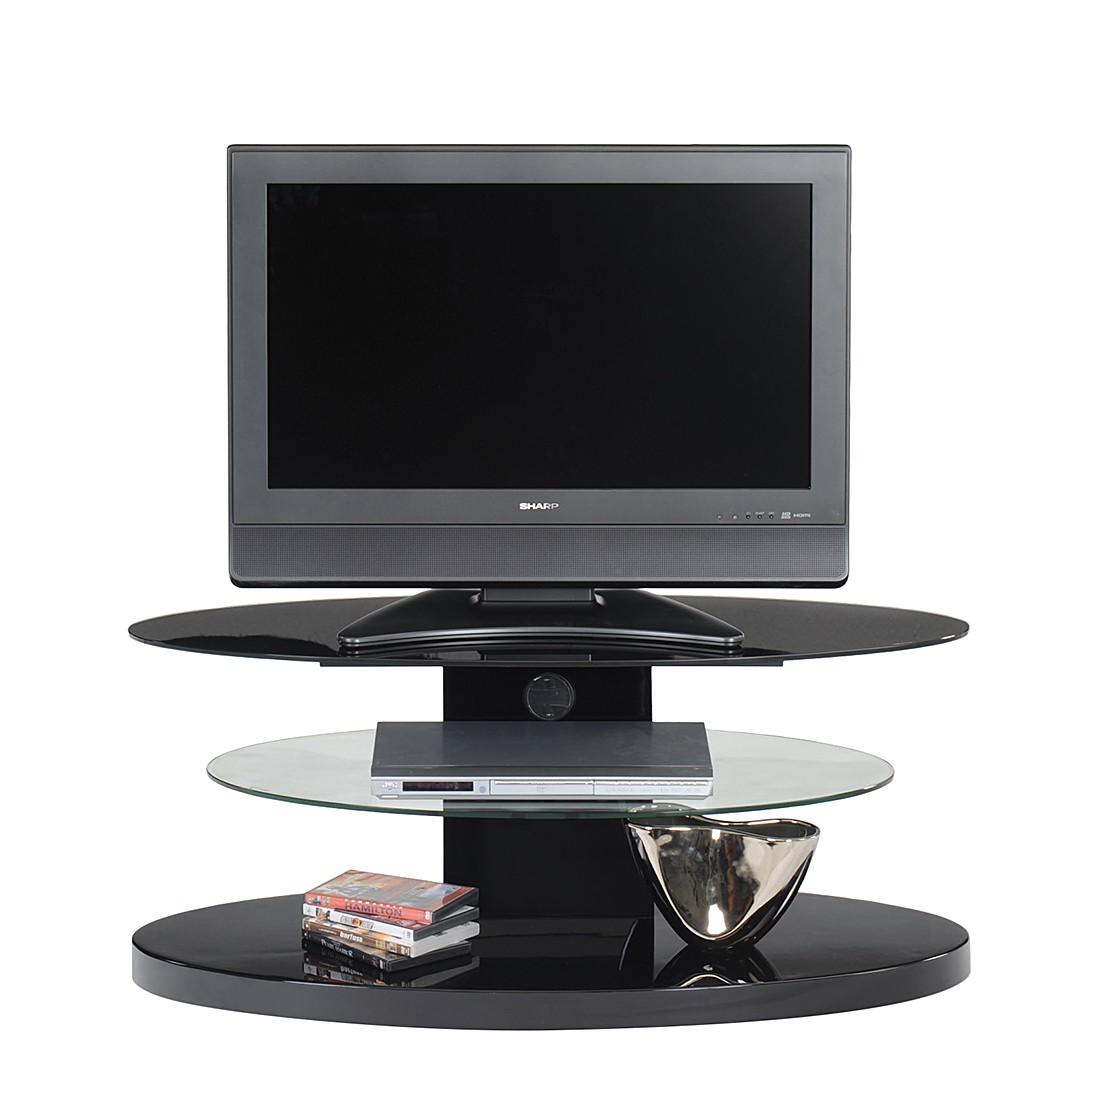 tv rack cuuba mojo 300 hochglanz schwarz elliptische form. Black Bedroom Furniture Sets. Home Design Ideas